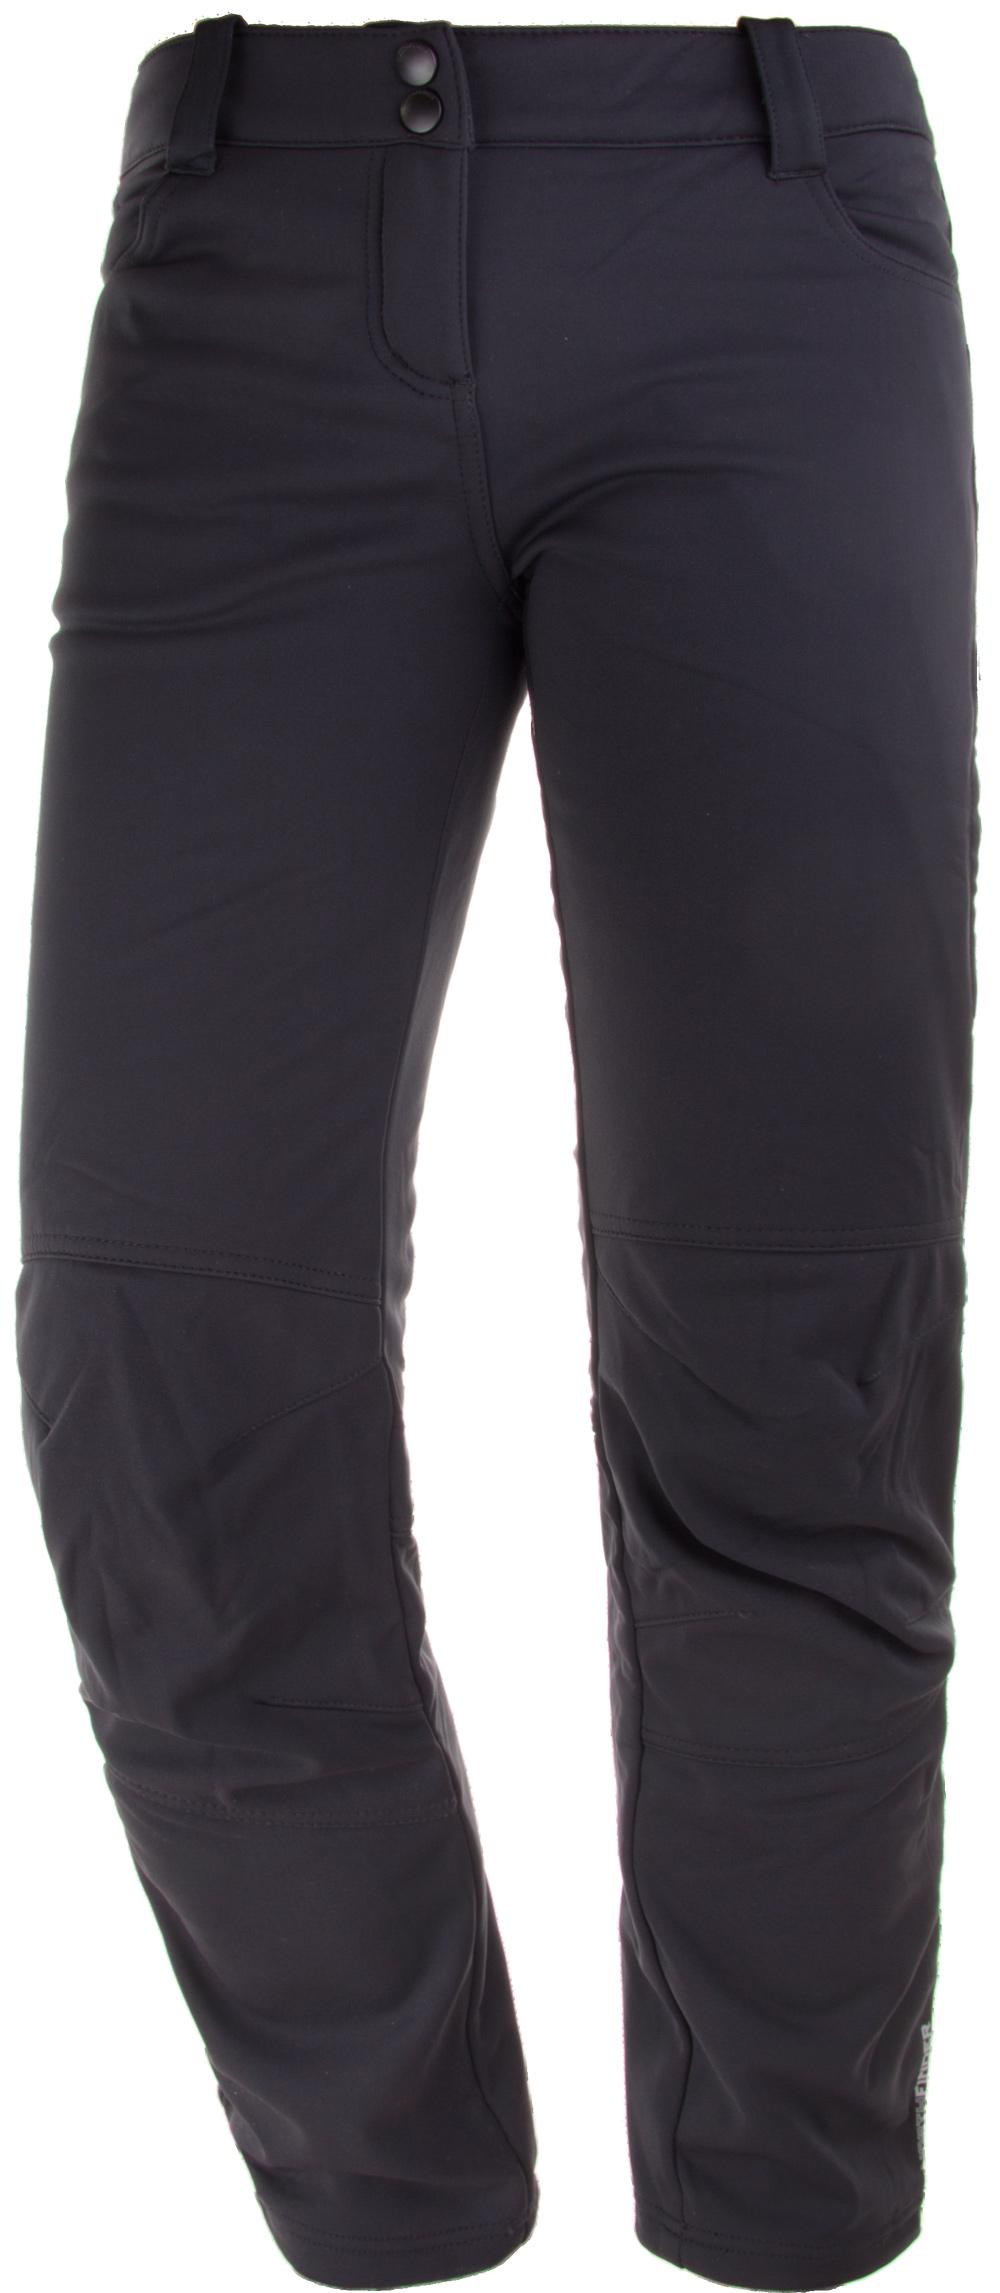 a768c9ab7f00 Kalhoty softshellové dámské NORTHFINDER ANASTASIA